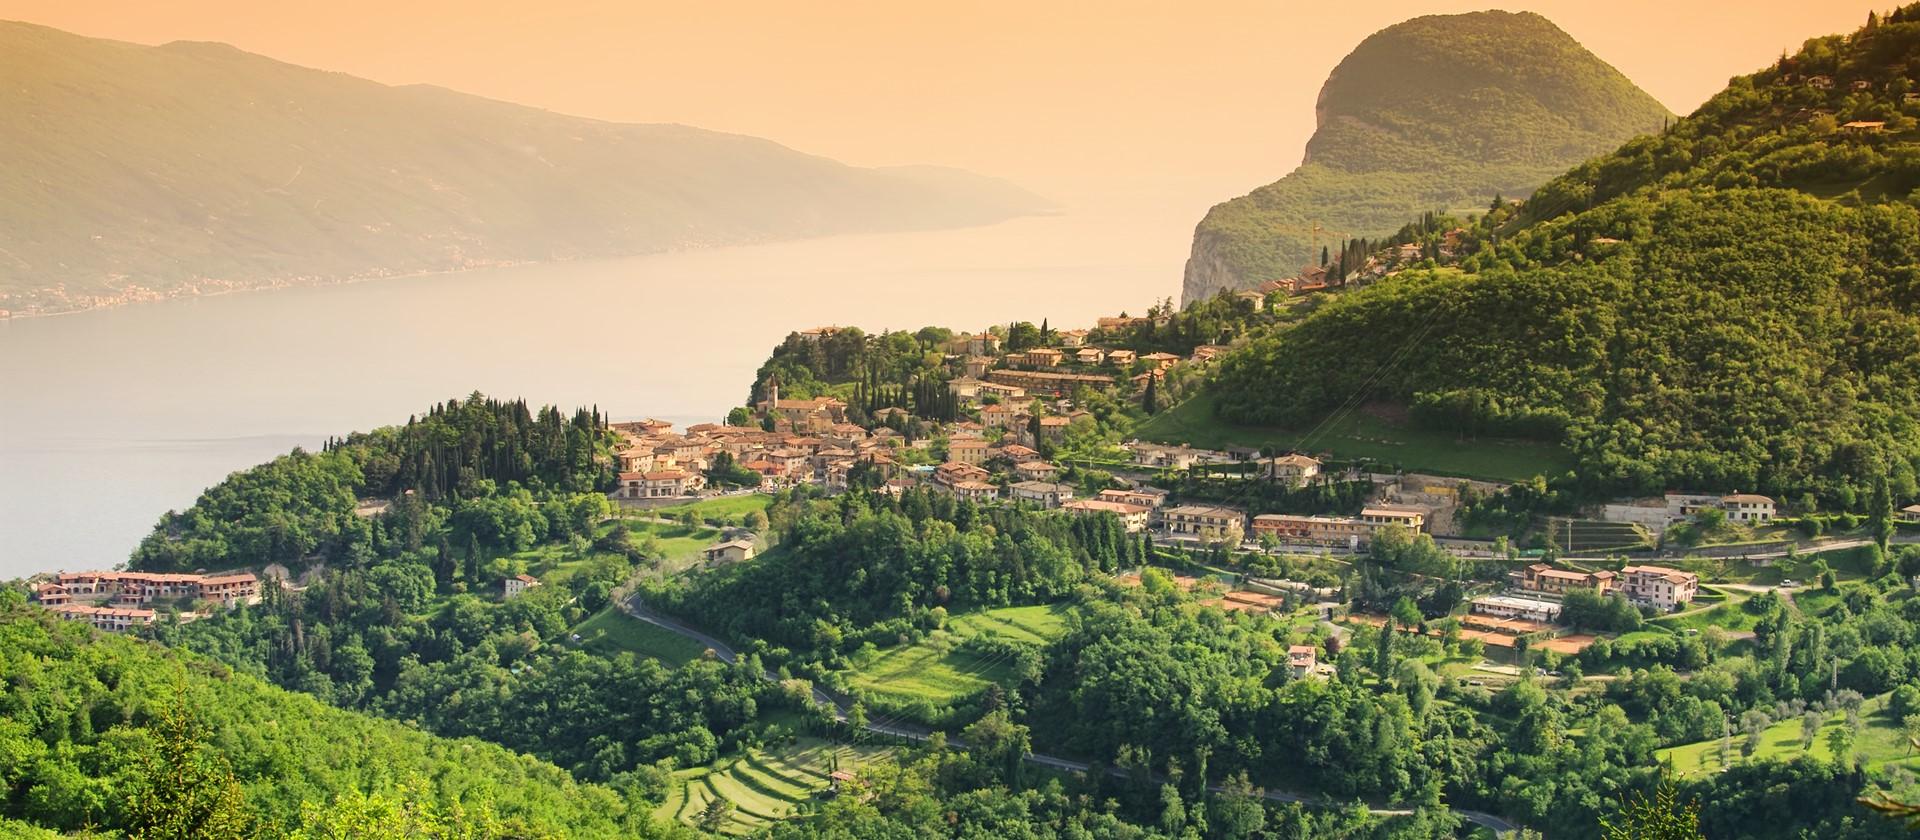 Holidays In Tremosine Discover Lake Garda